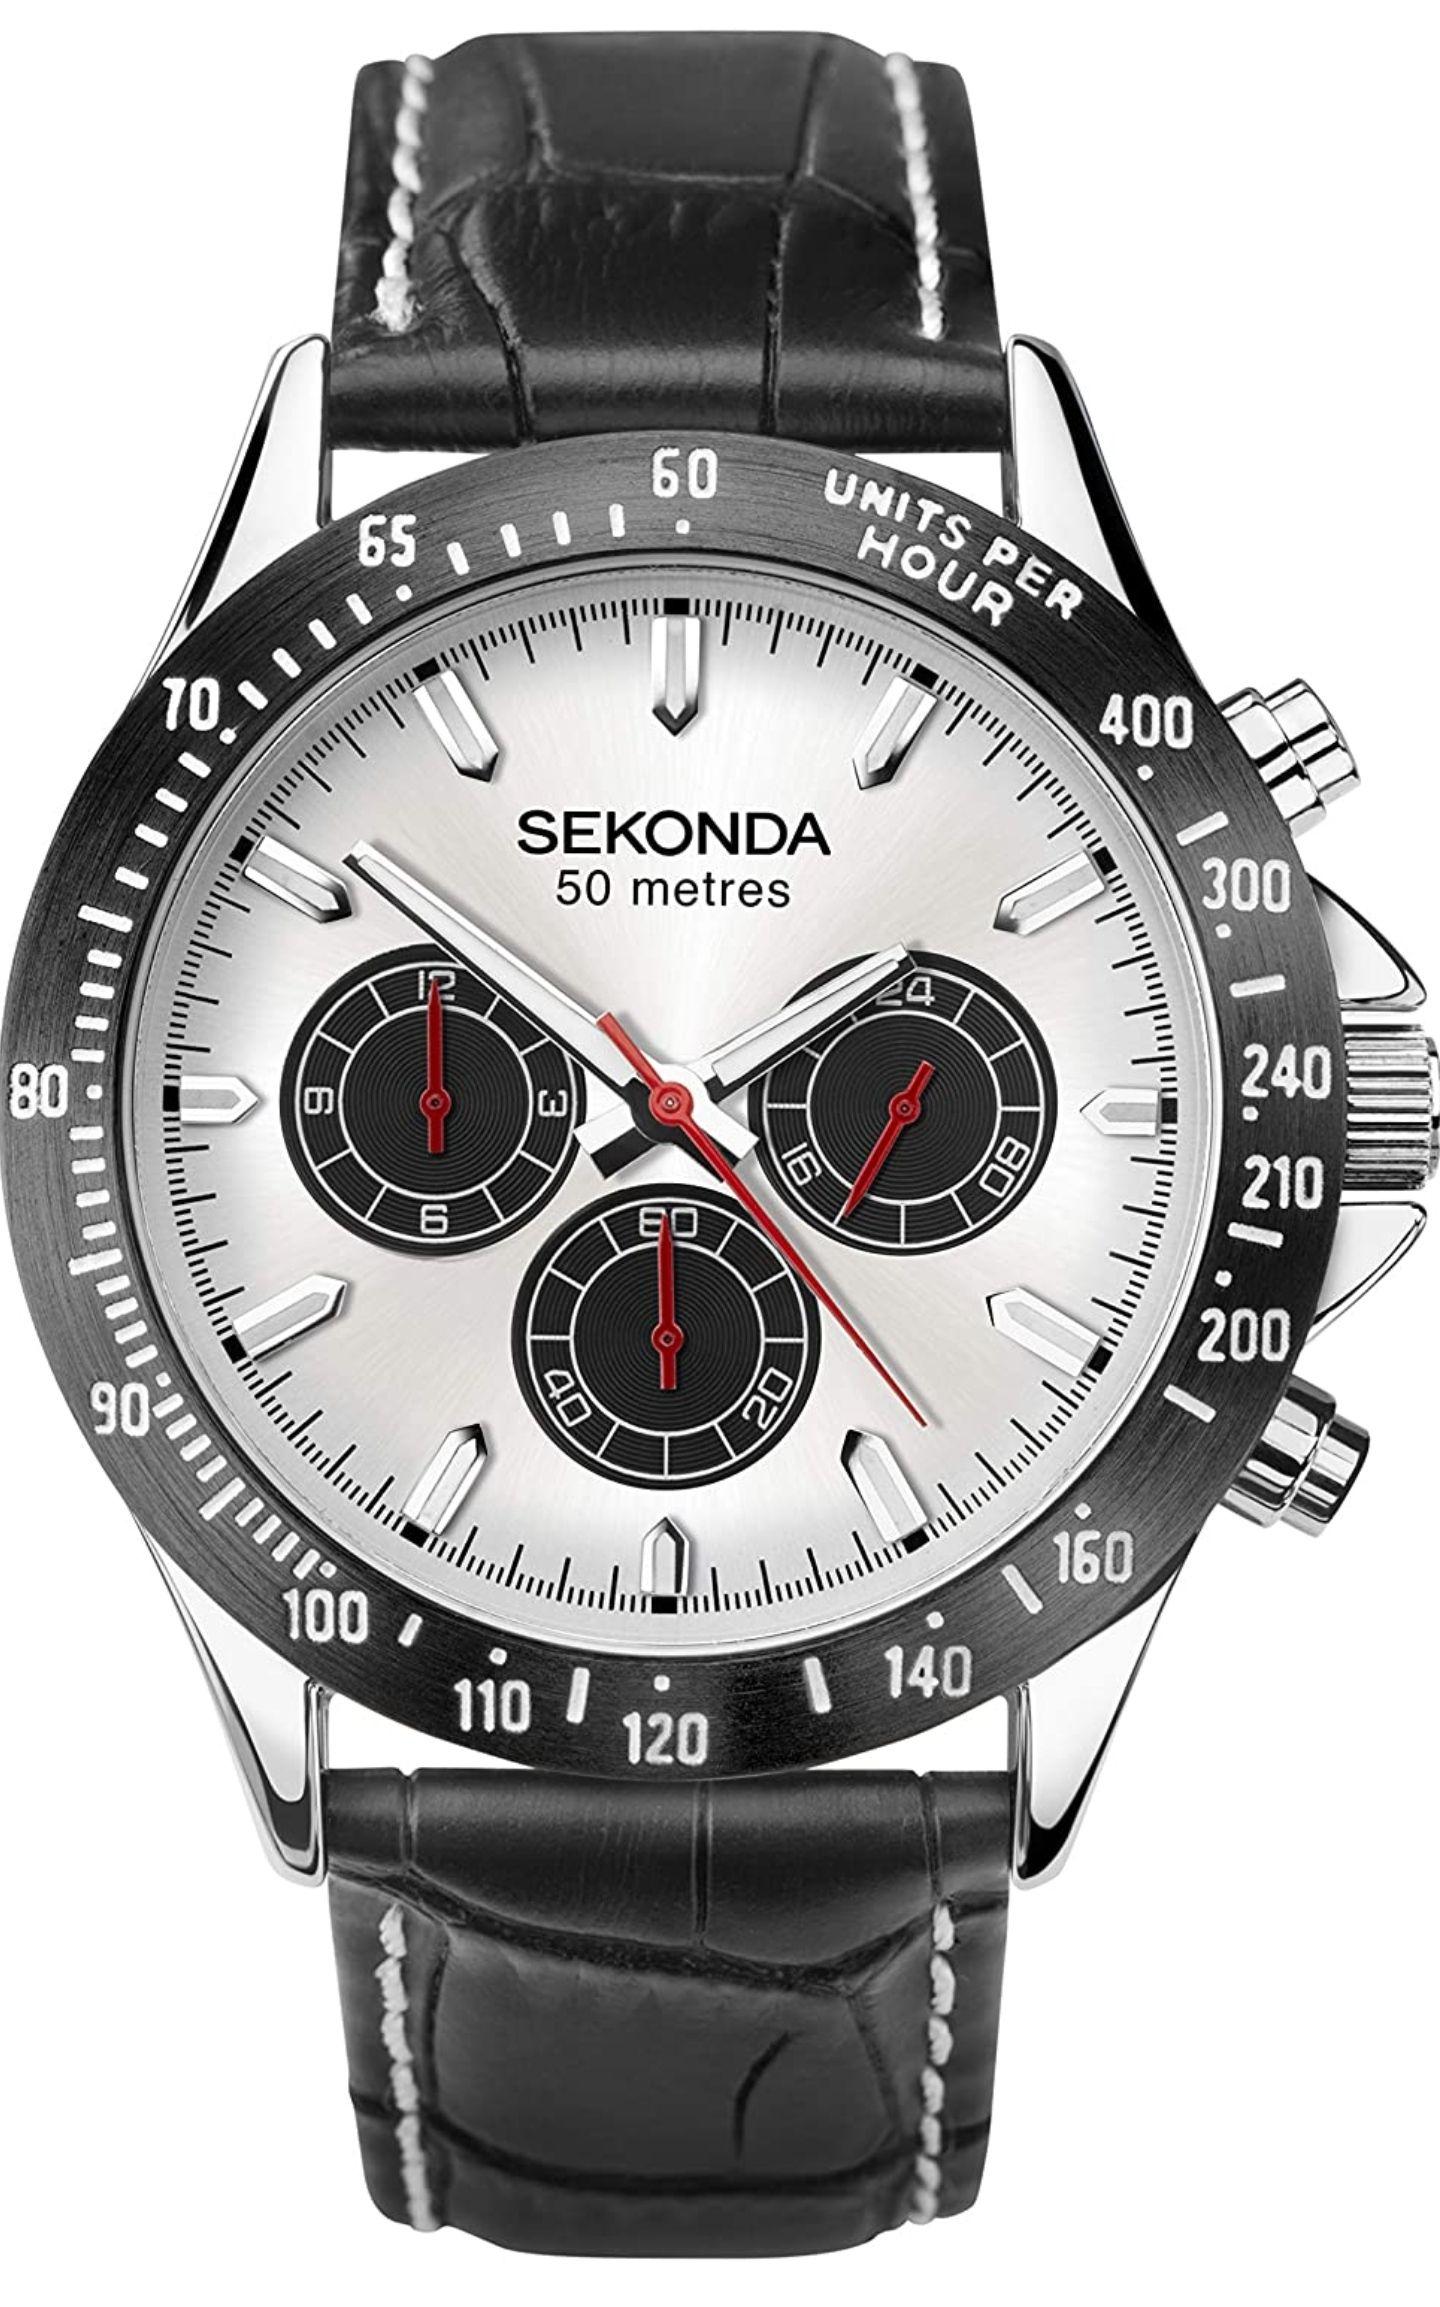 SEKONDA Sport Watch 1647 White Dial Black Accents - £34.98 @ Amazon